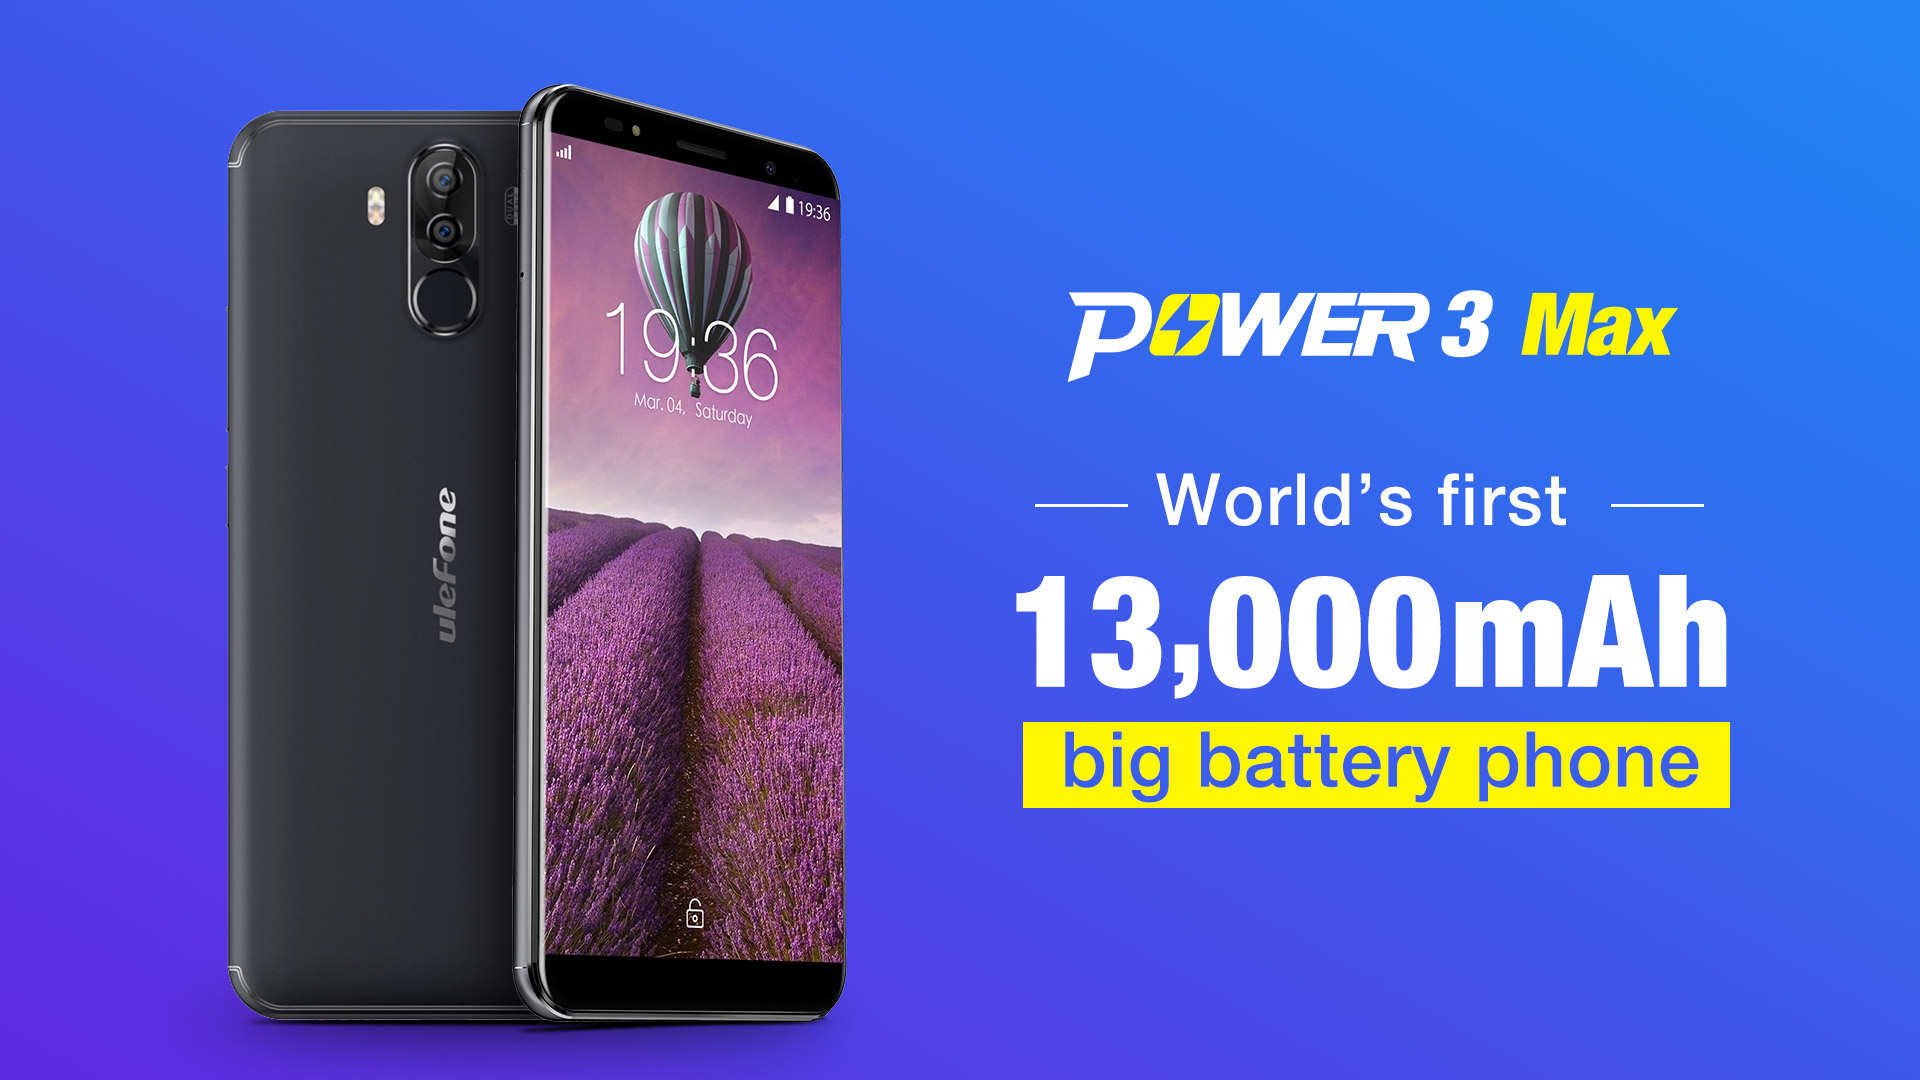 Ulefone Power 3 Max